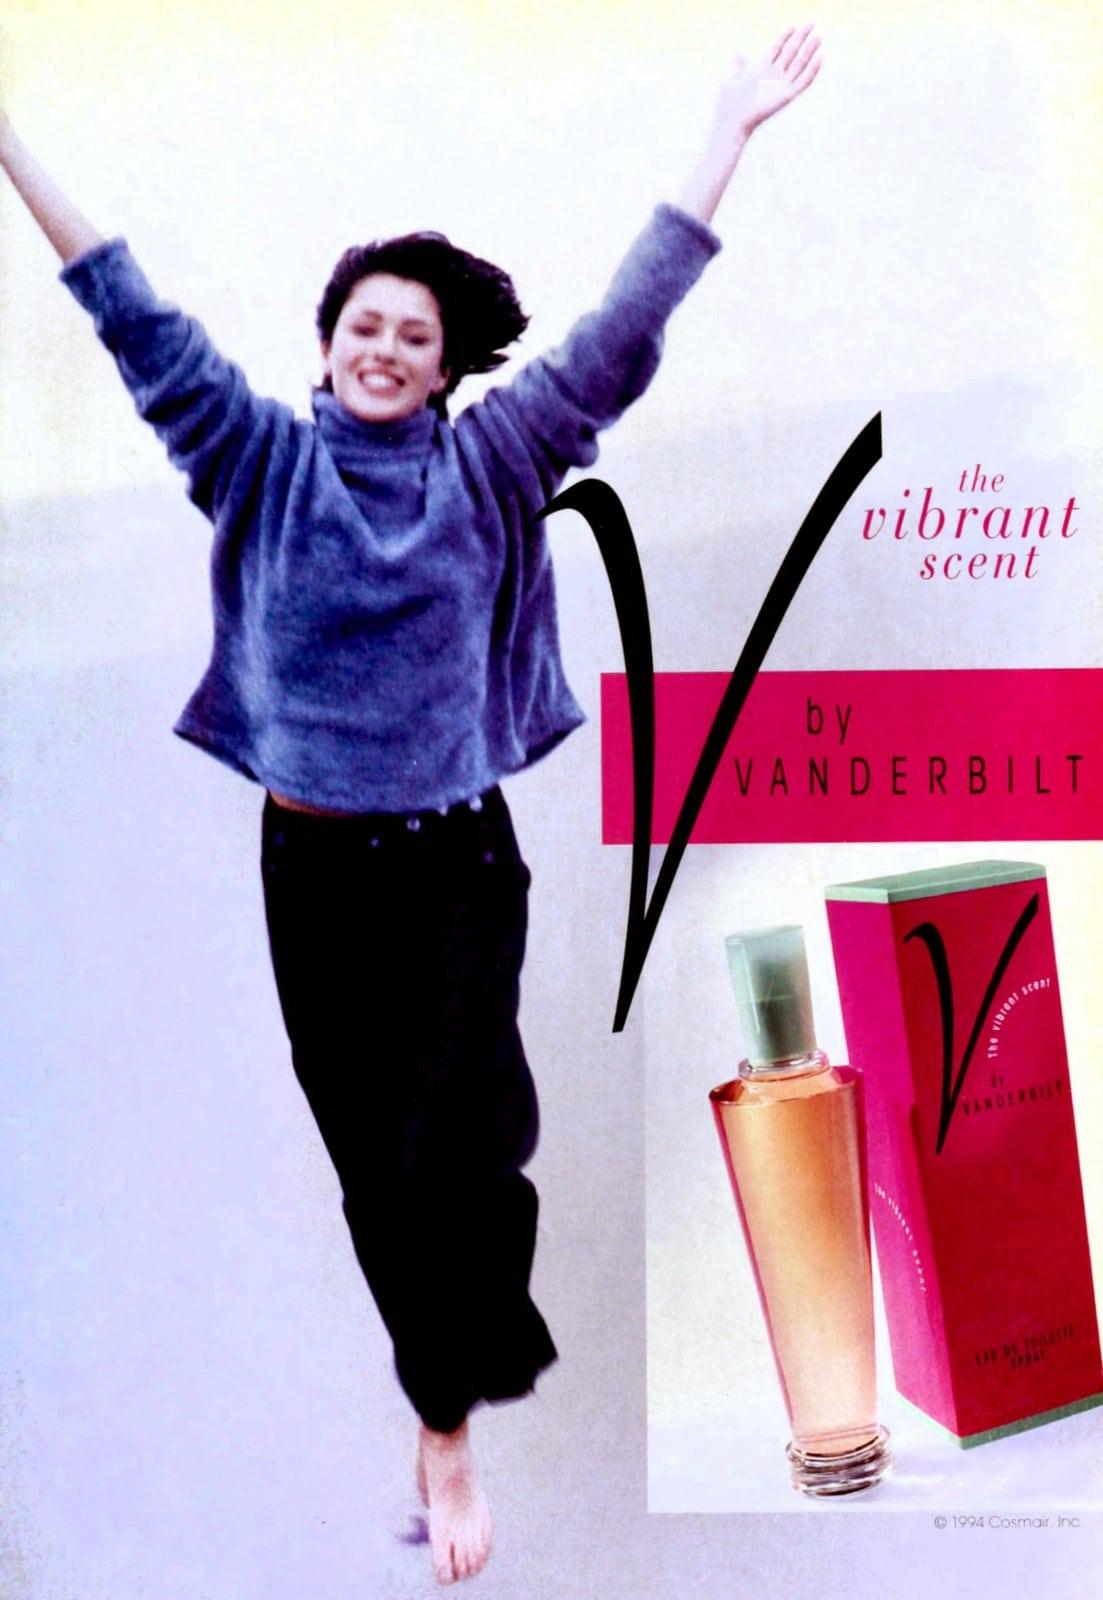 Vanderbilt eau de toilette by Gloria Vanderbilt (1994)